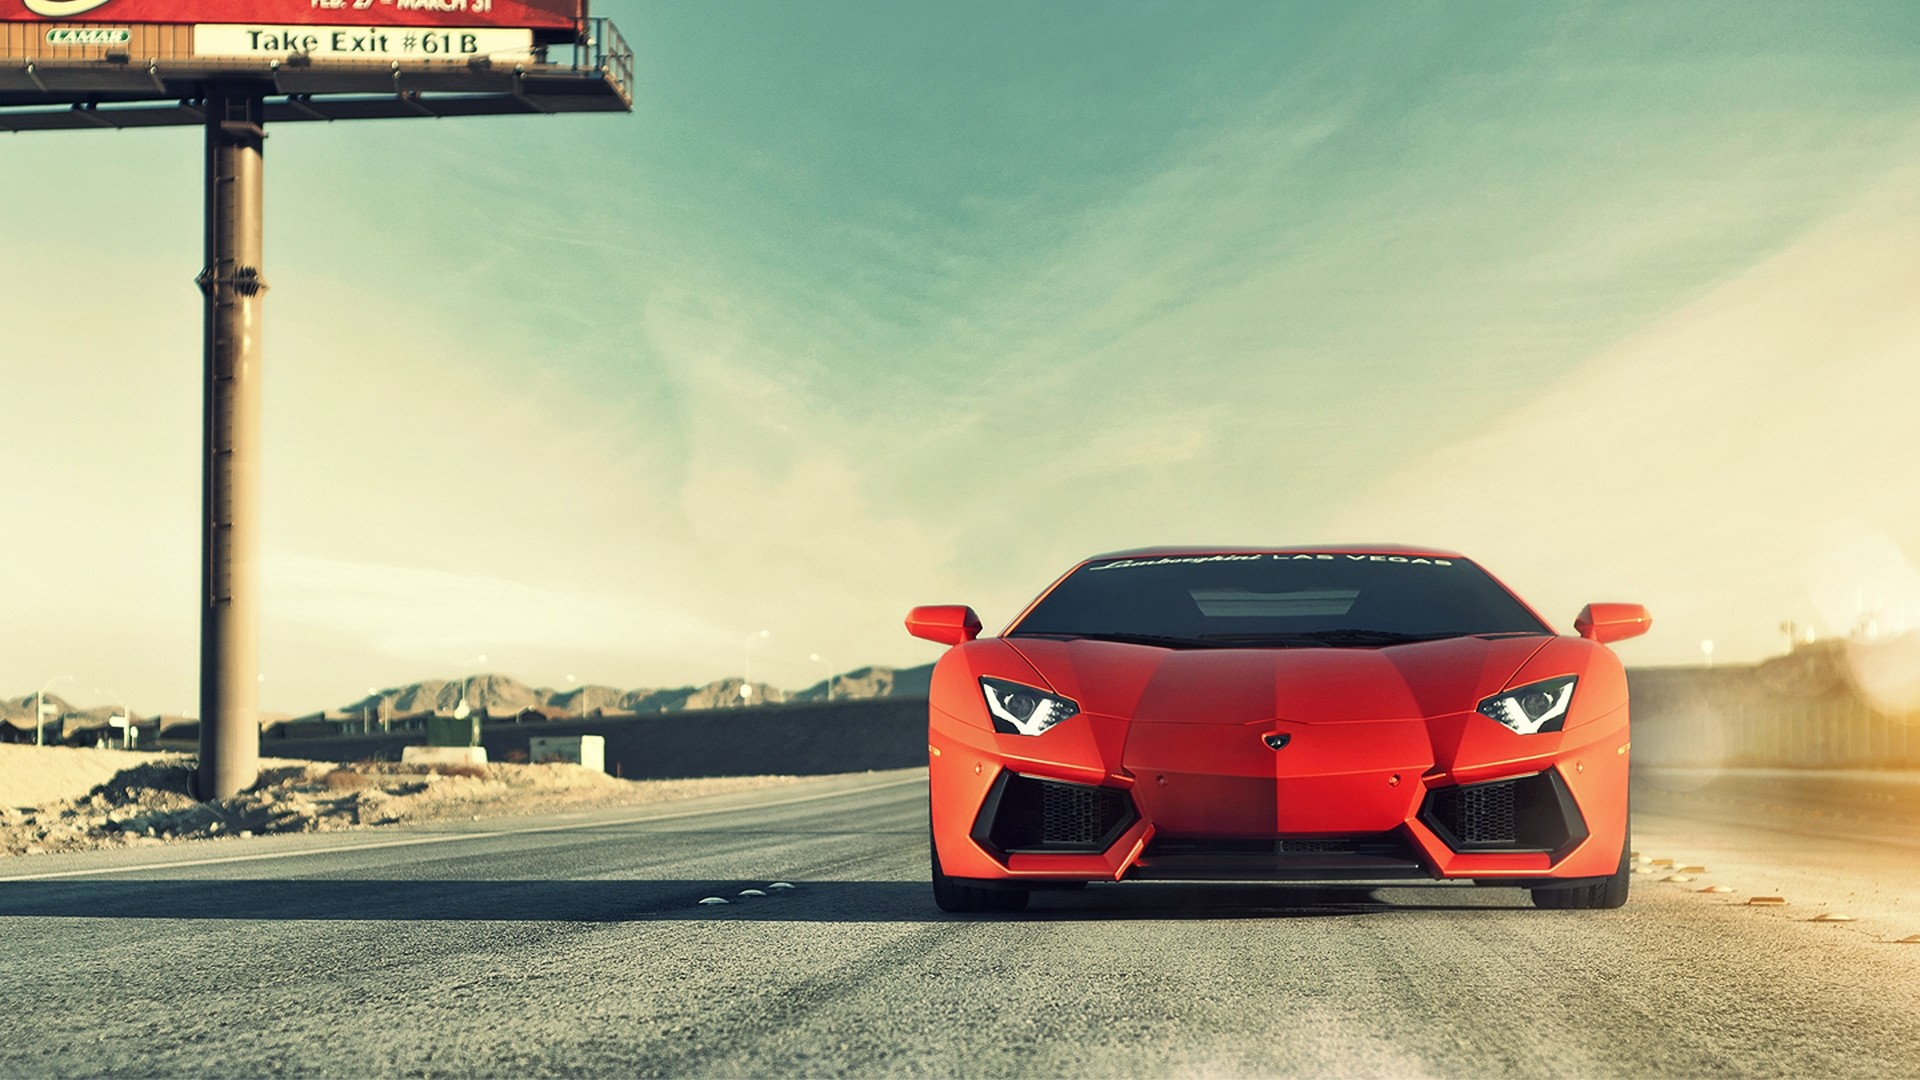 Lamborghini HD Wallpaper | Background Image | 1920x1080 | ID:436002 - Wallpaper Abyss